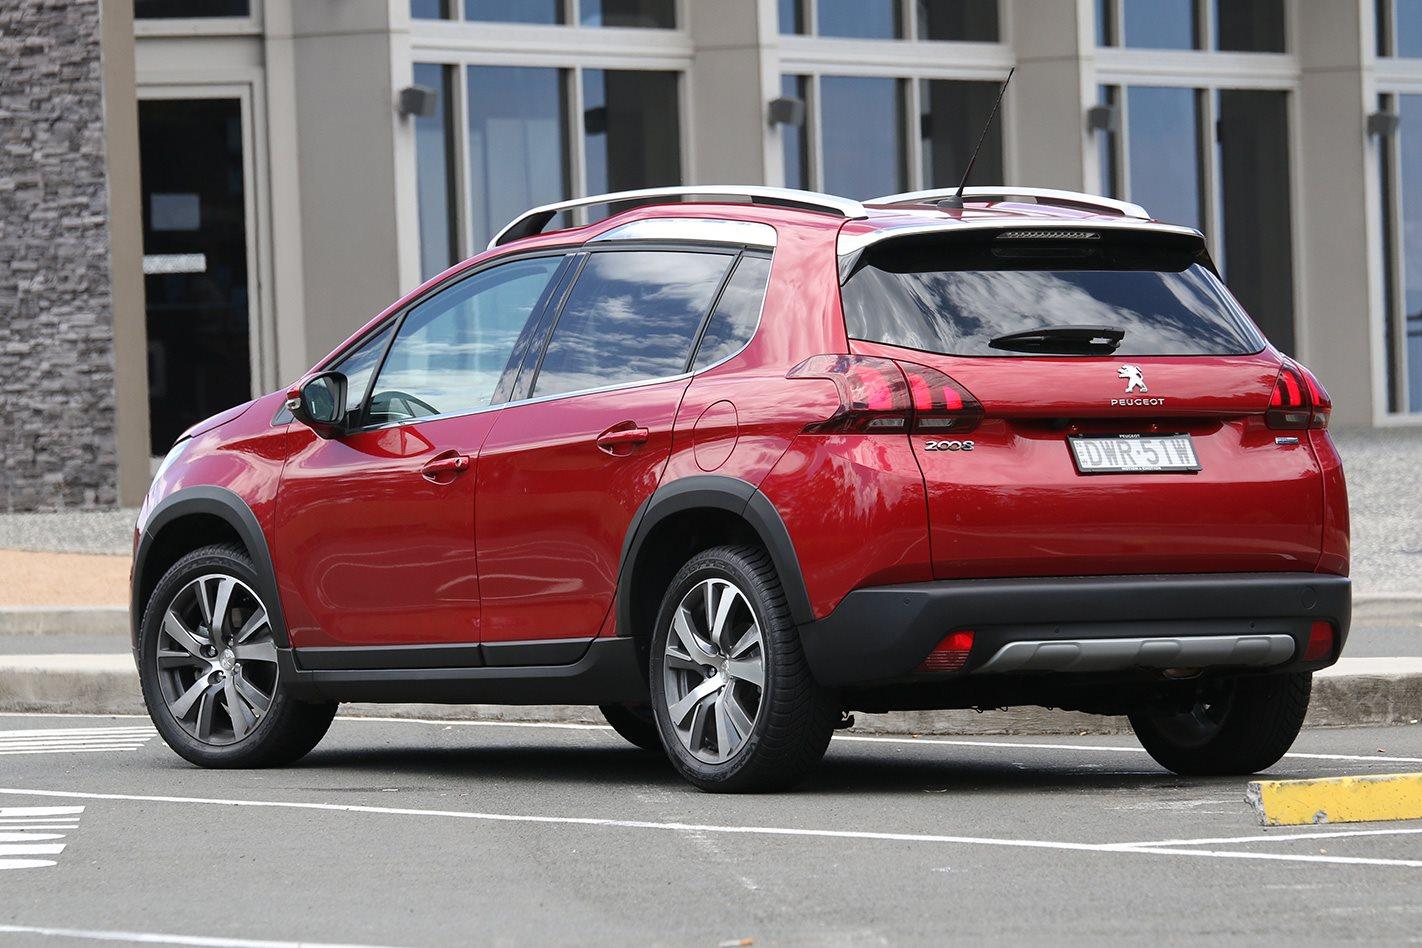 2019 Peugeot 2008 Allure Review